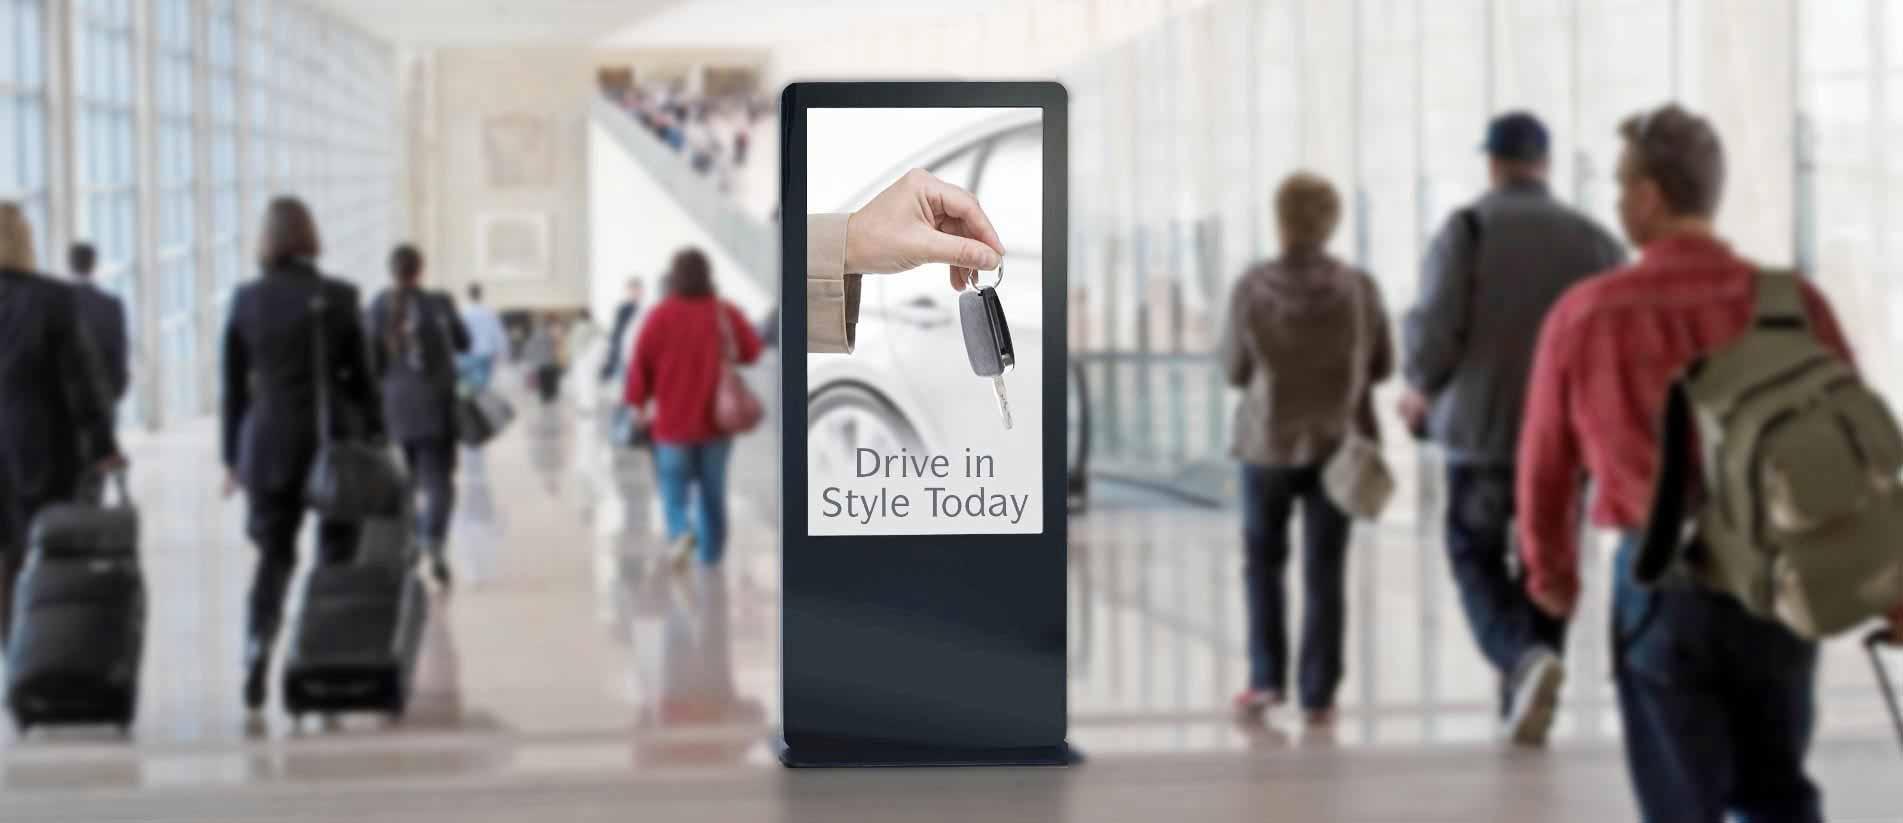 Kiosk Digital Signage 1